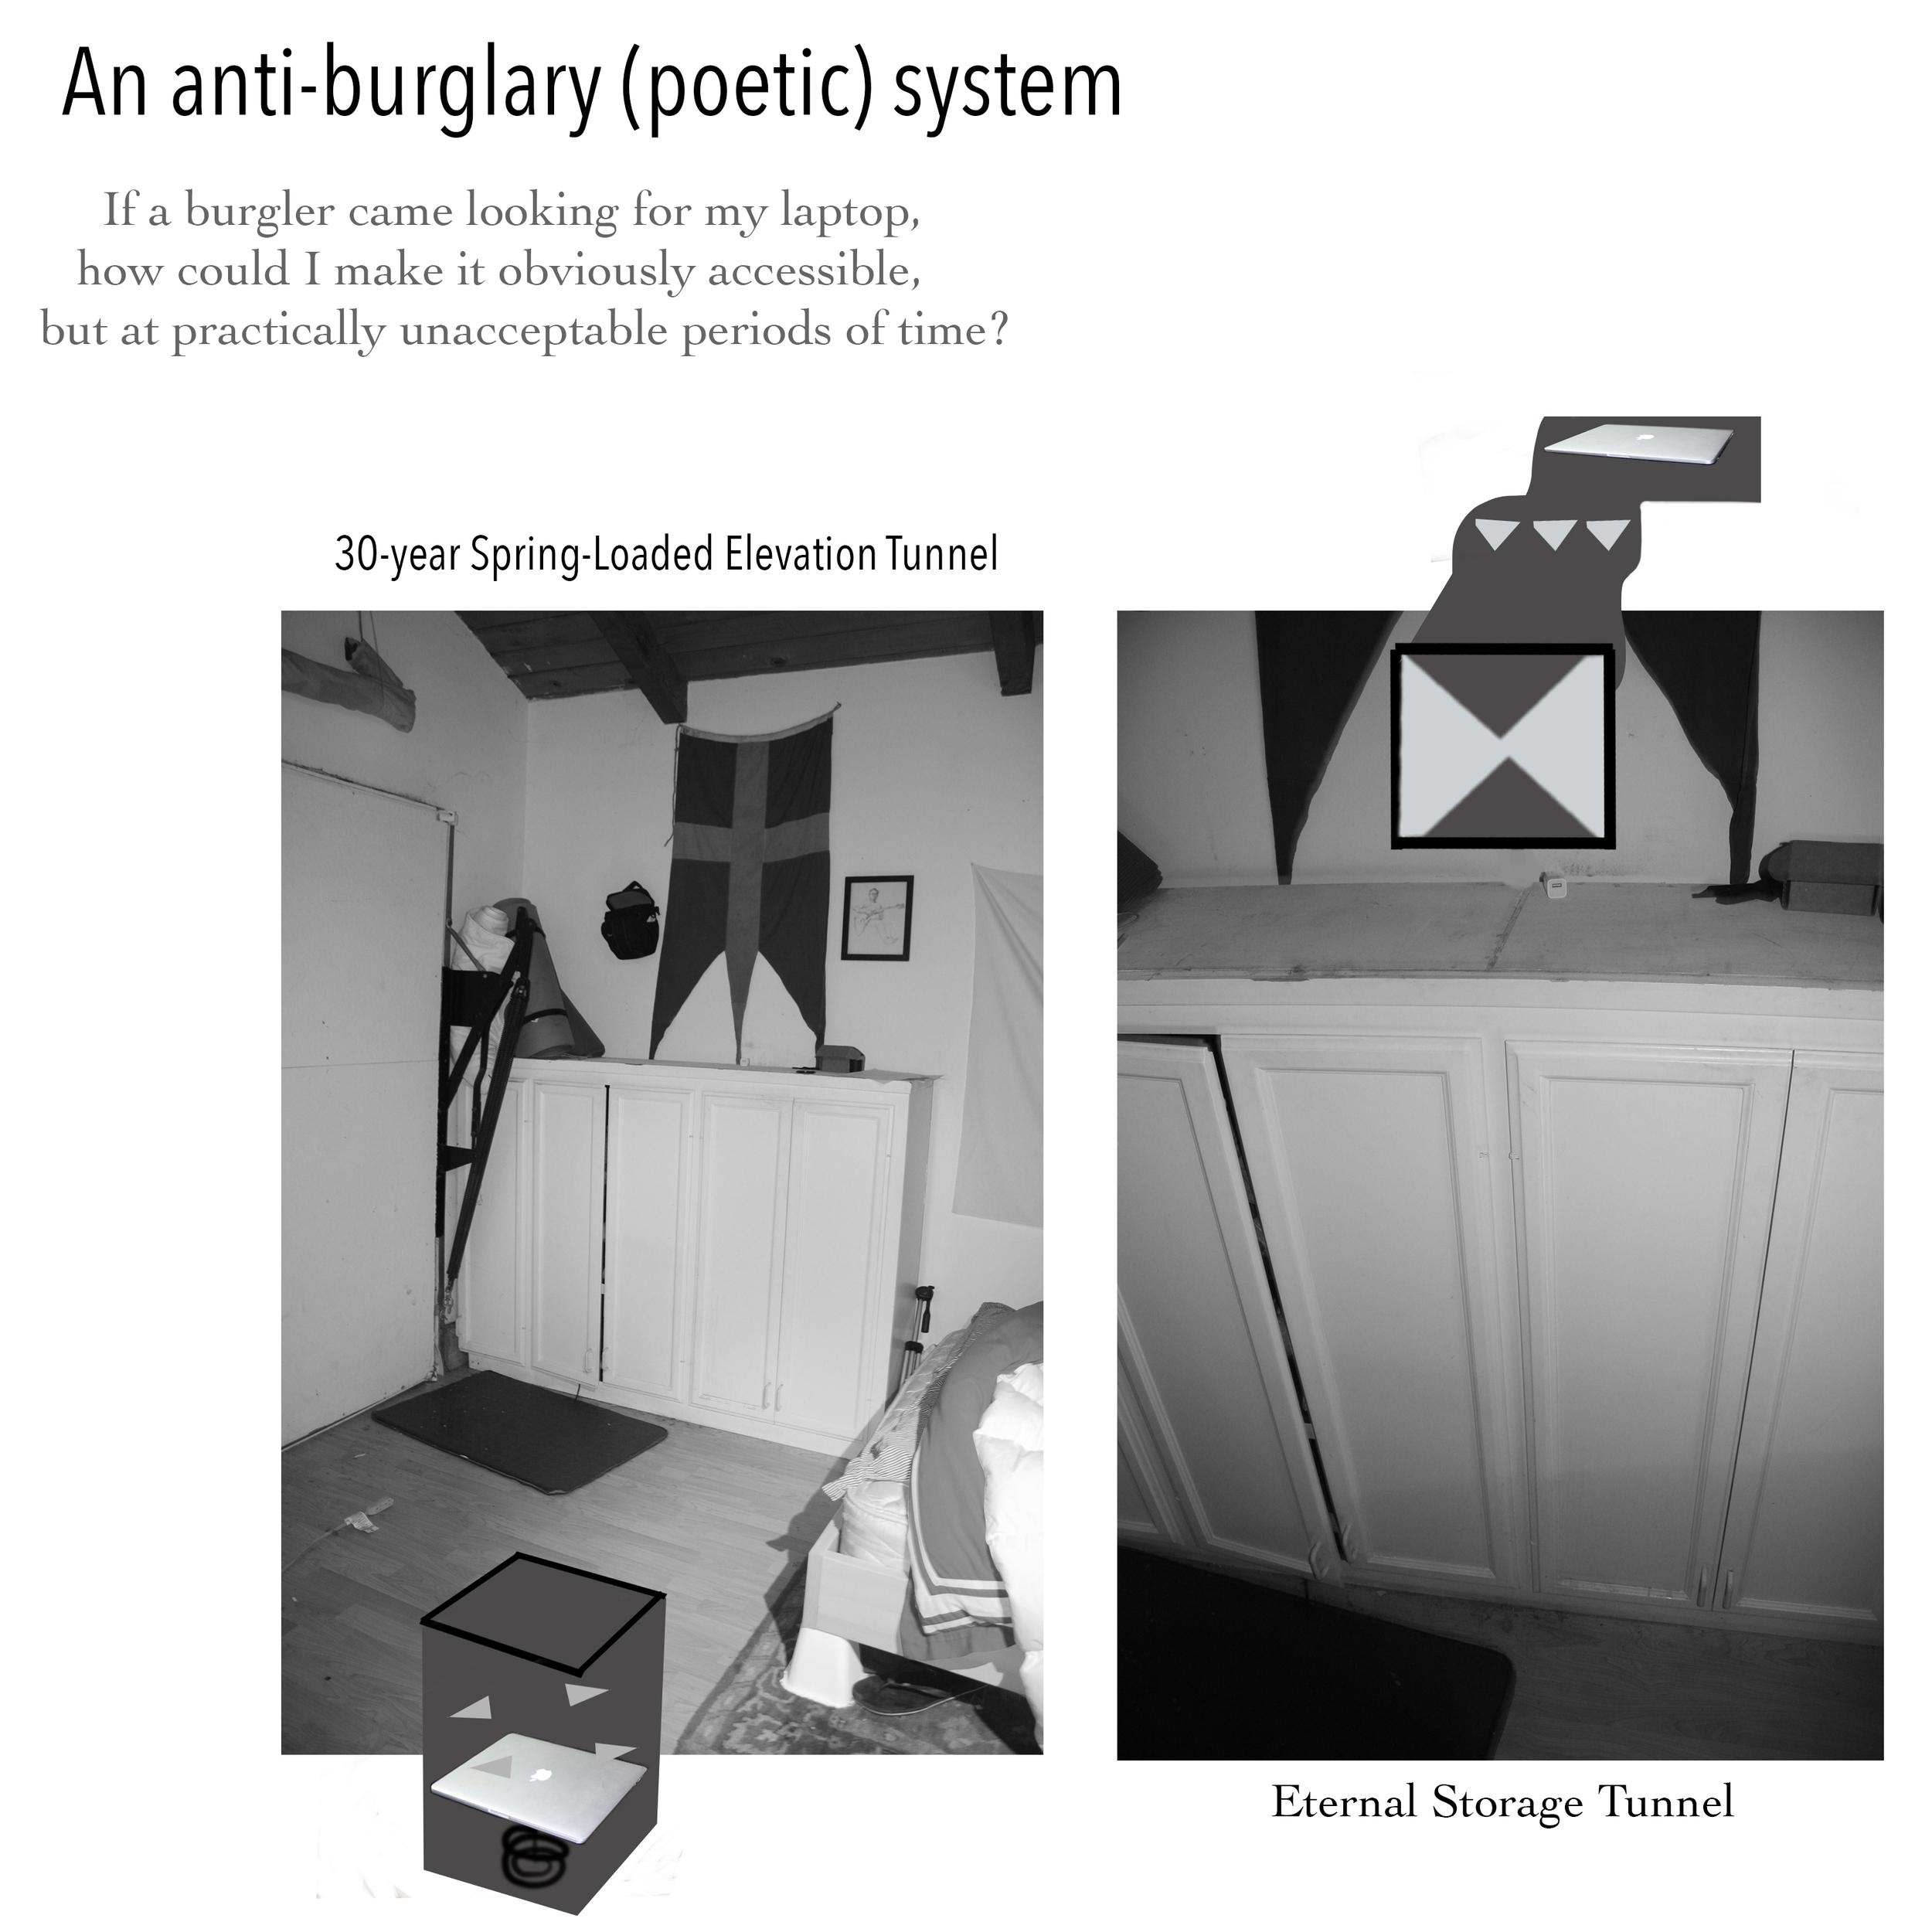 An Anti-Burglary (Poetic) System